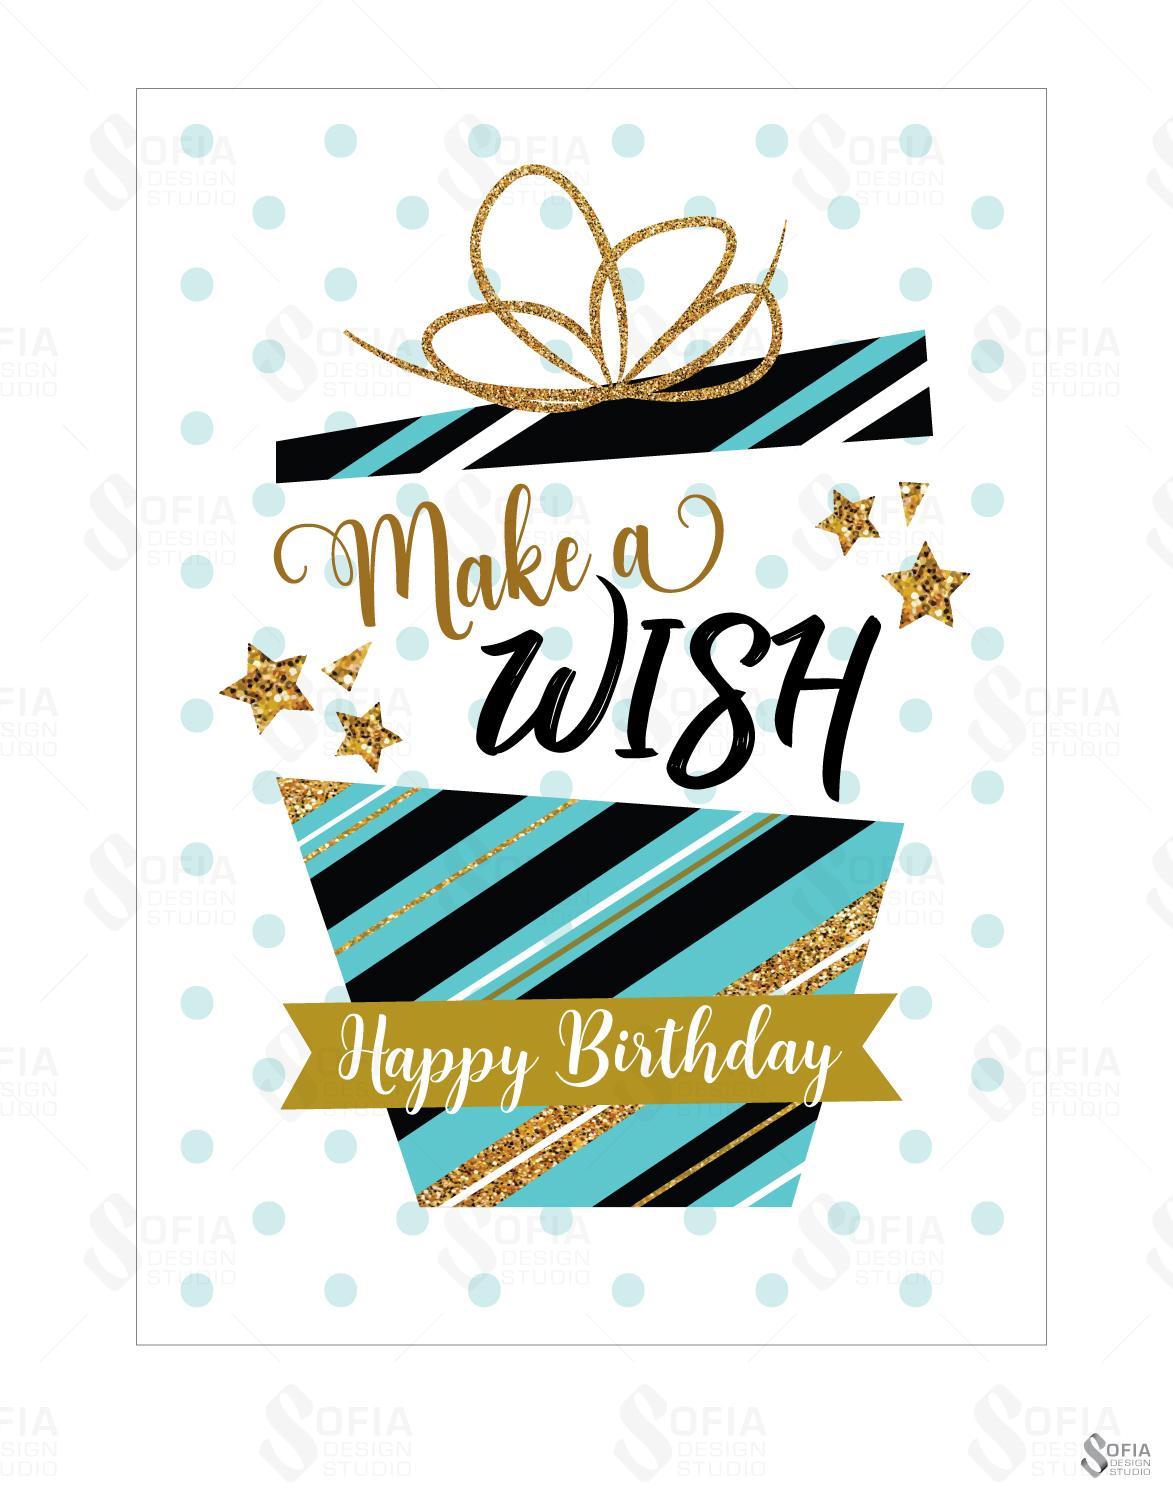 Online greeting card designer akbaeenw online greeting card designer m4hsunfo